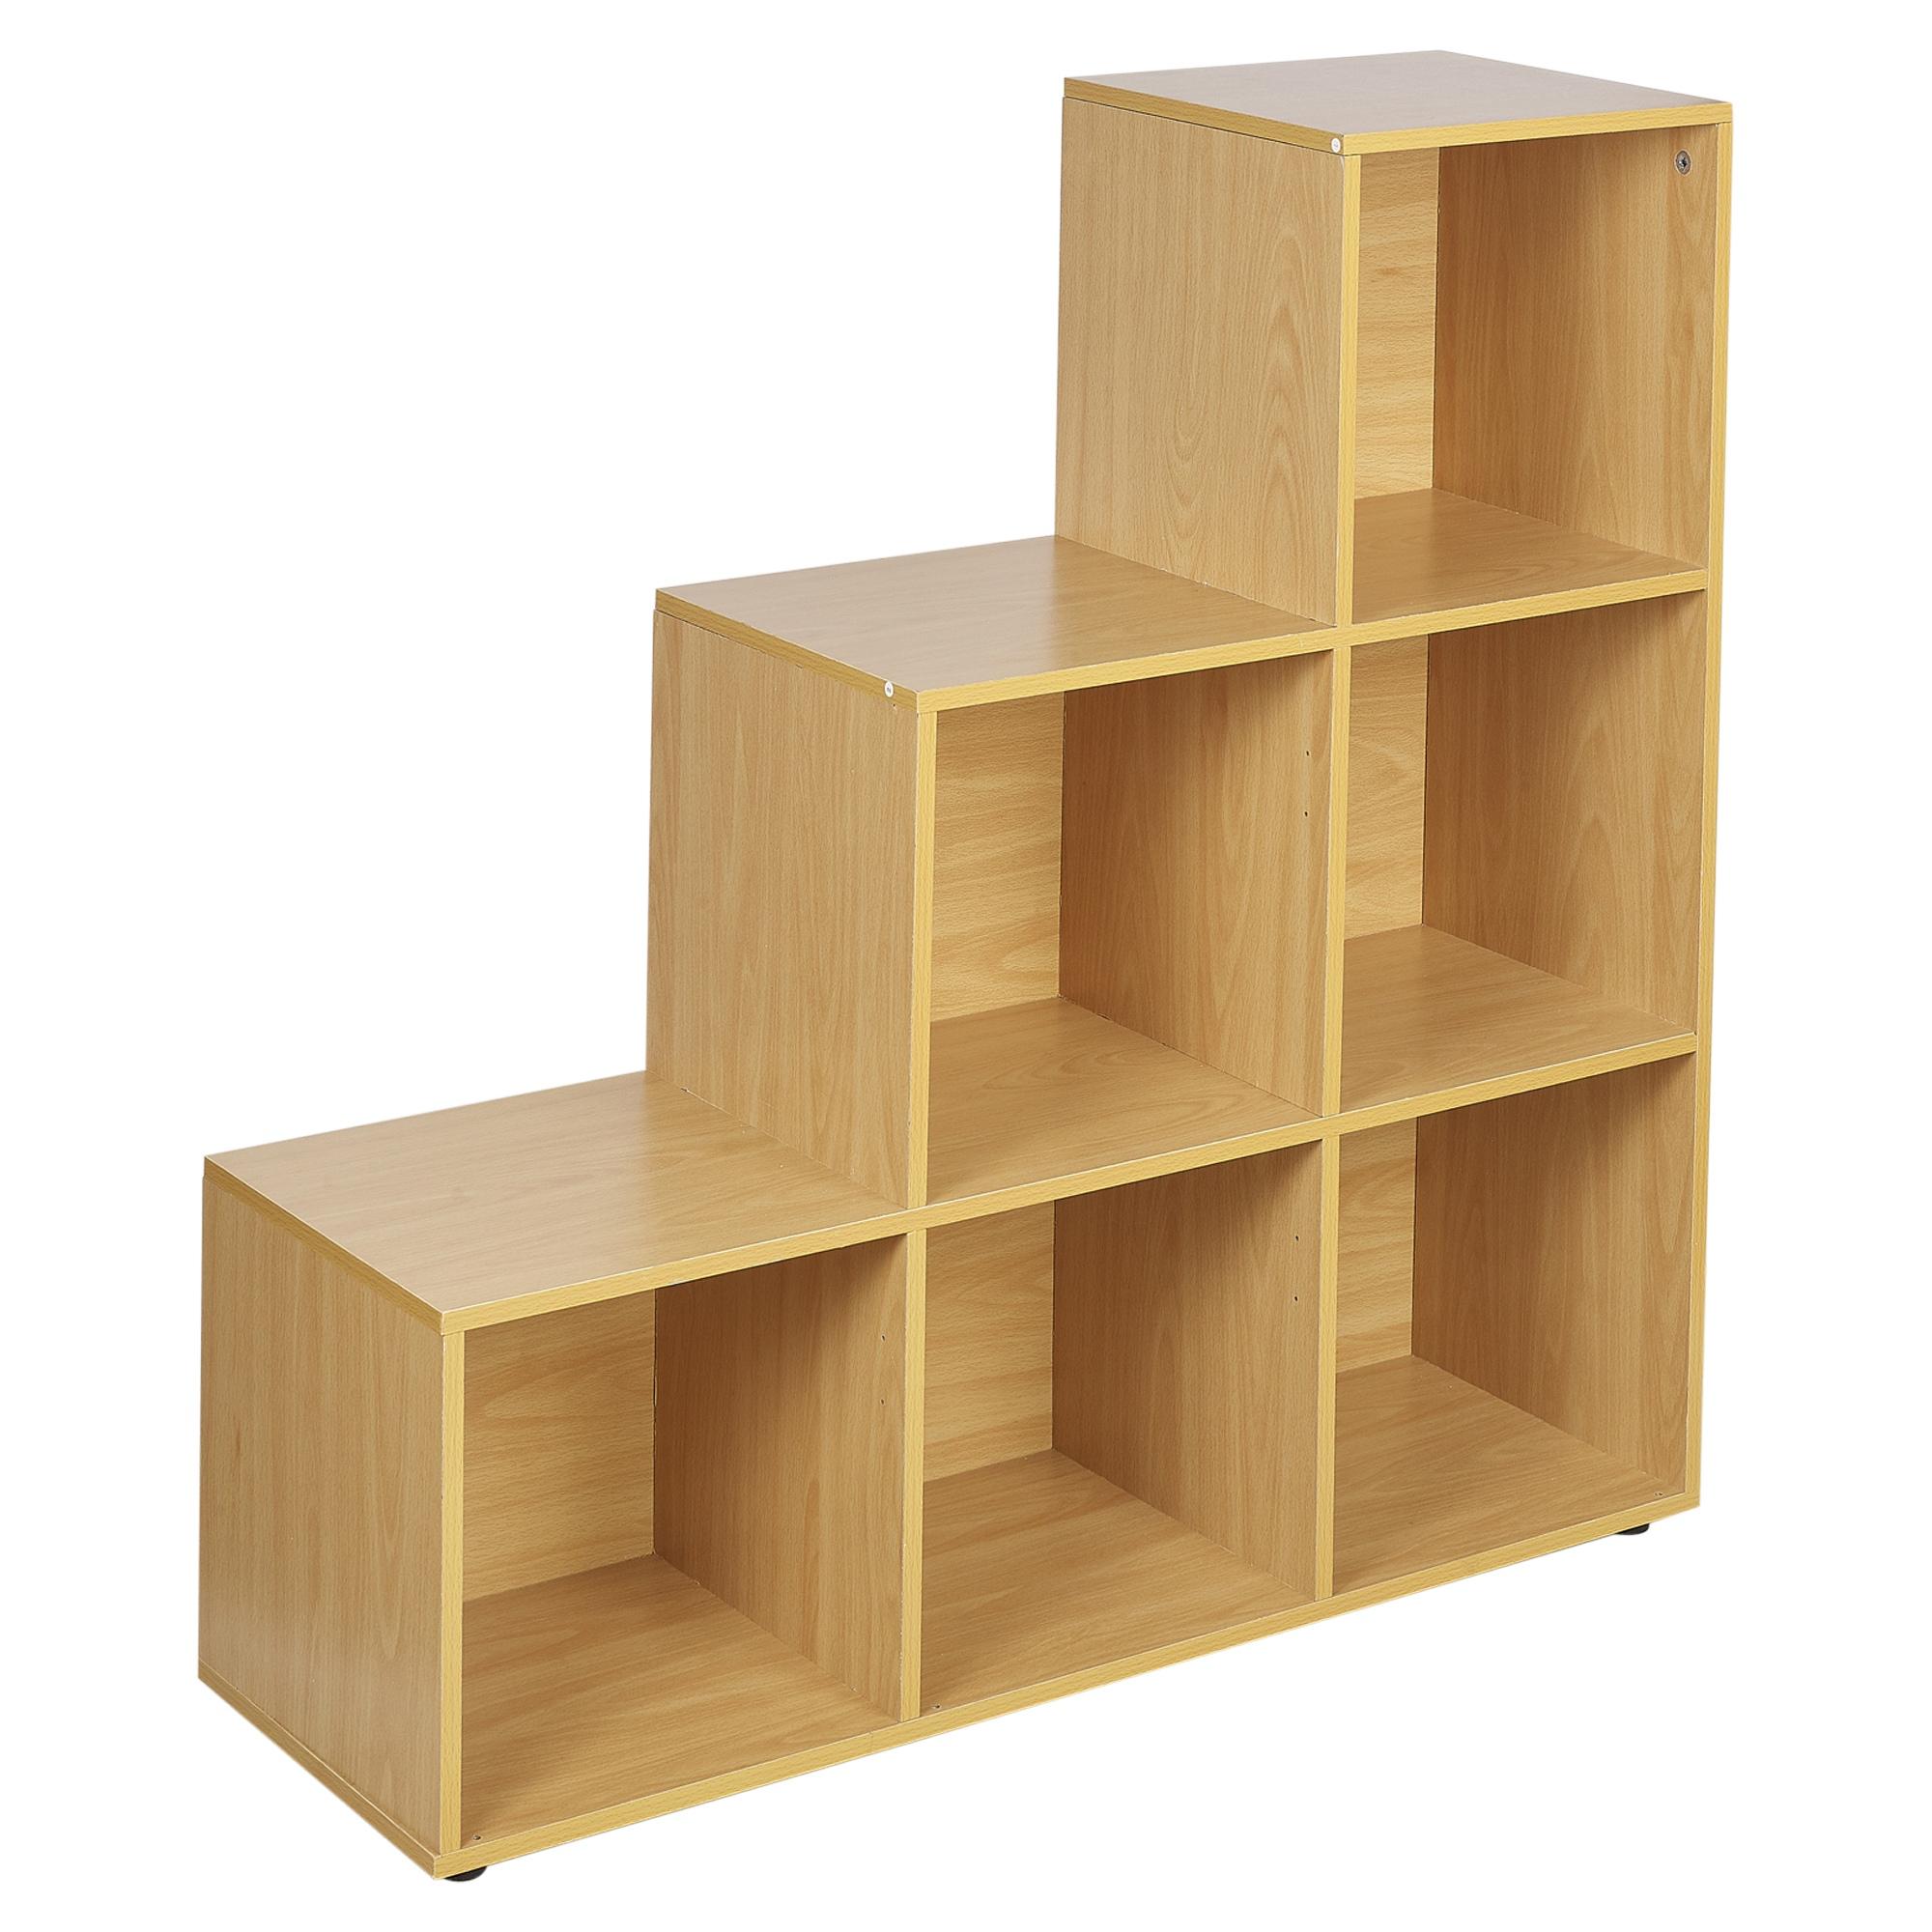 6 Cube Step Storage Bookcase Unit Shelf Home Office